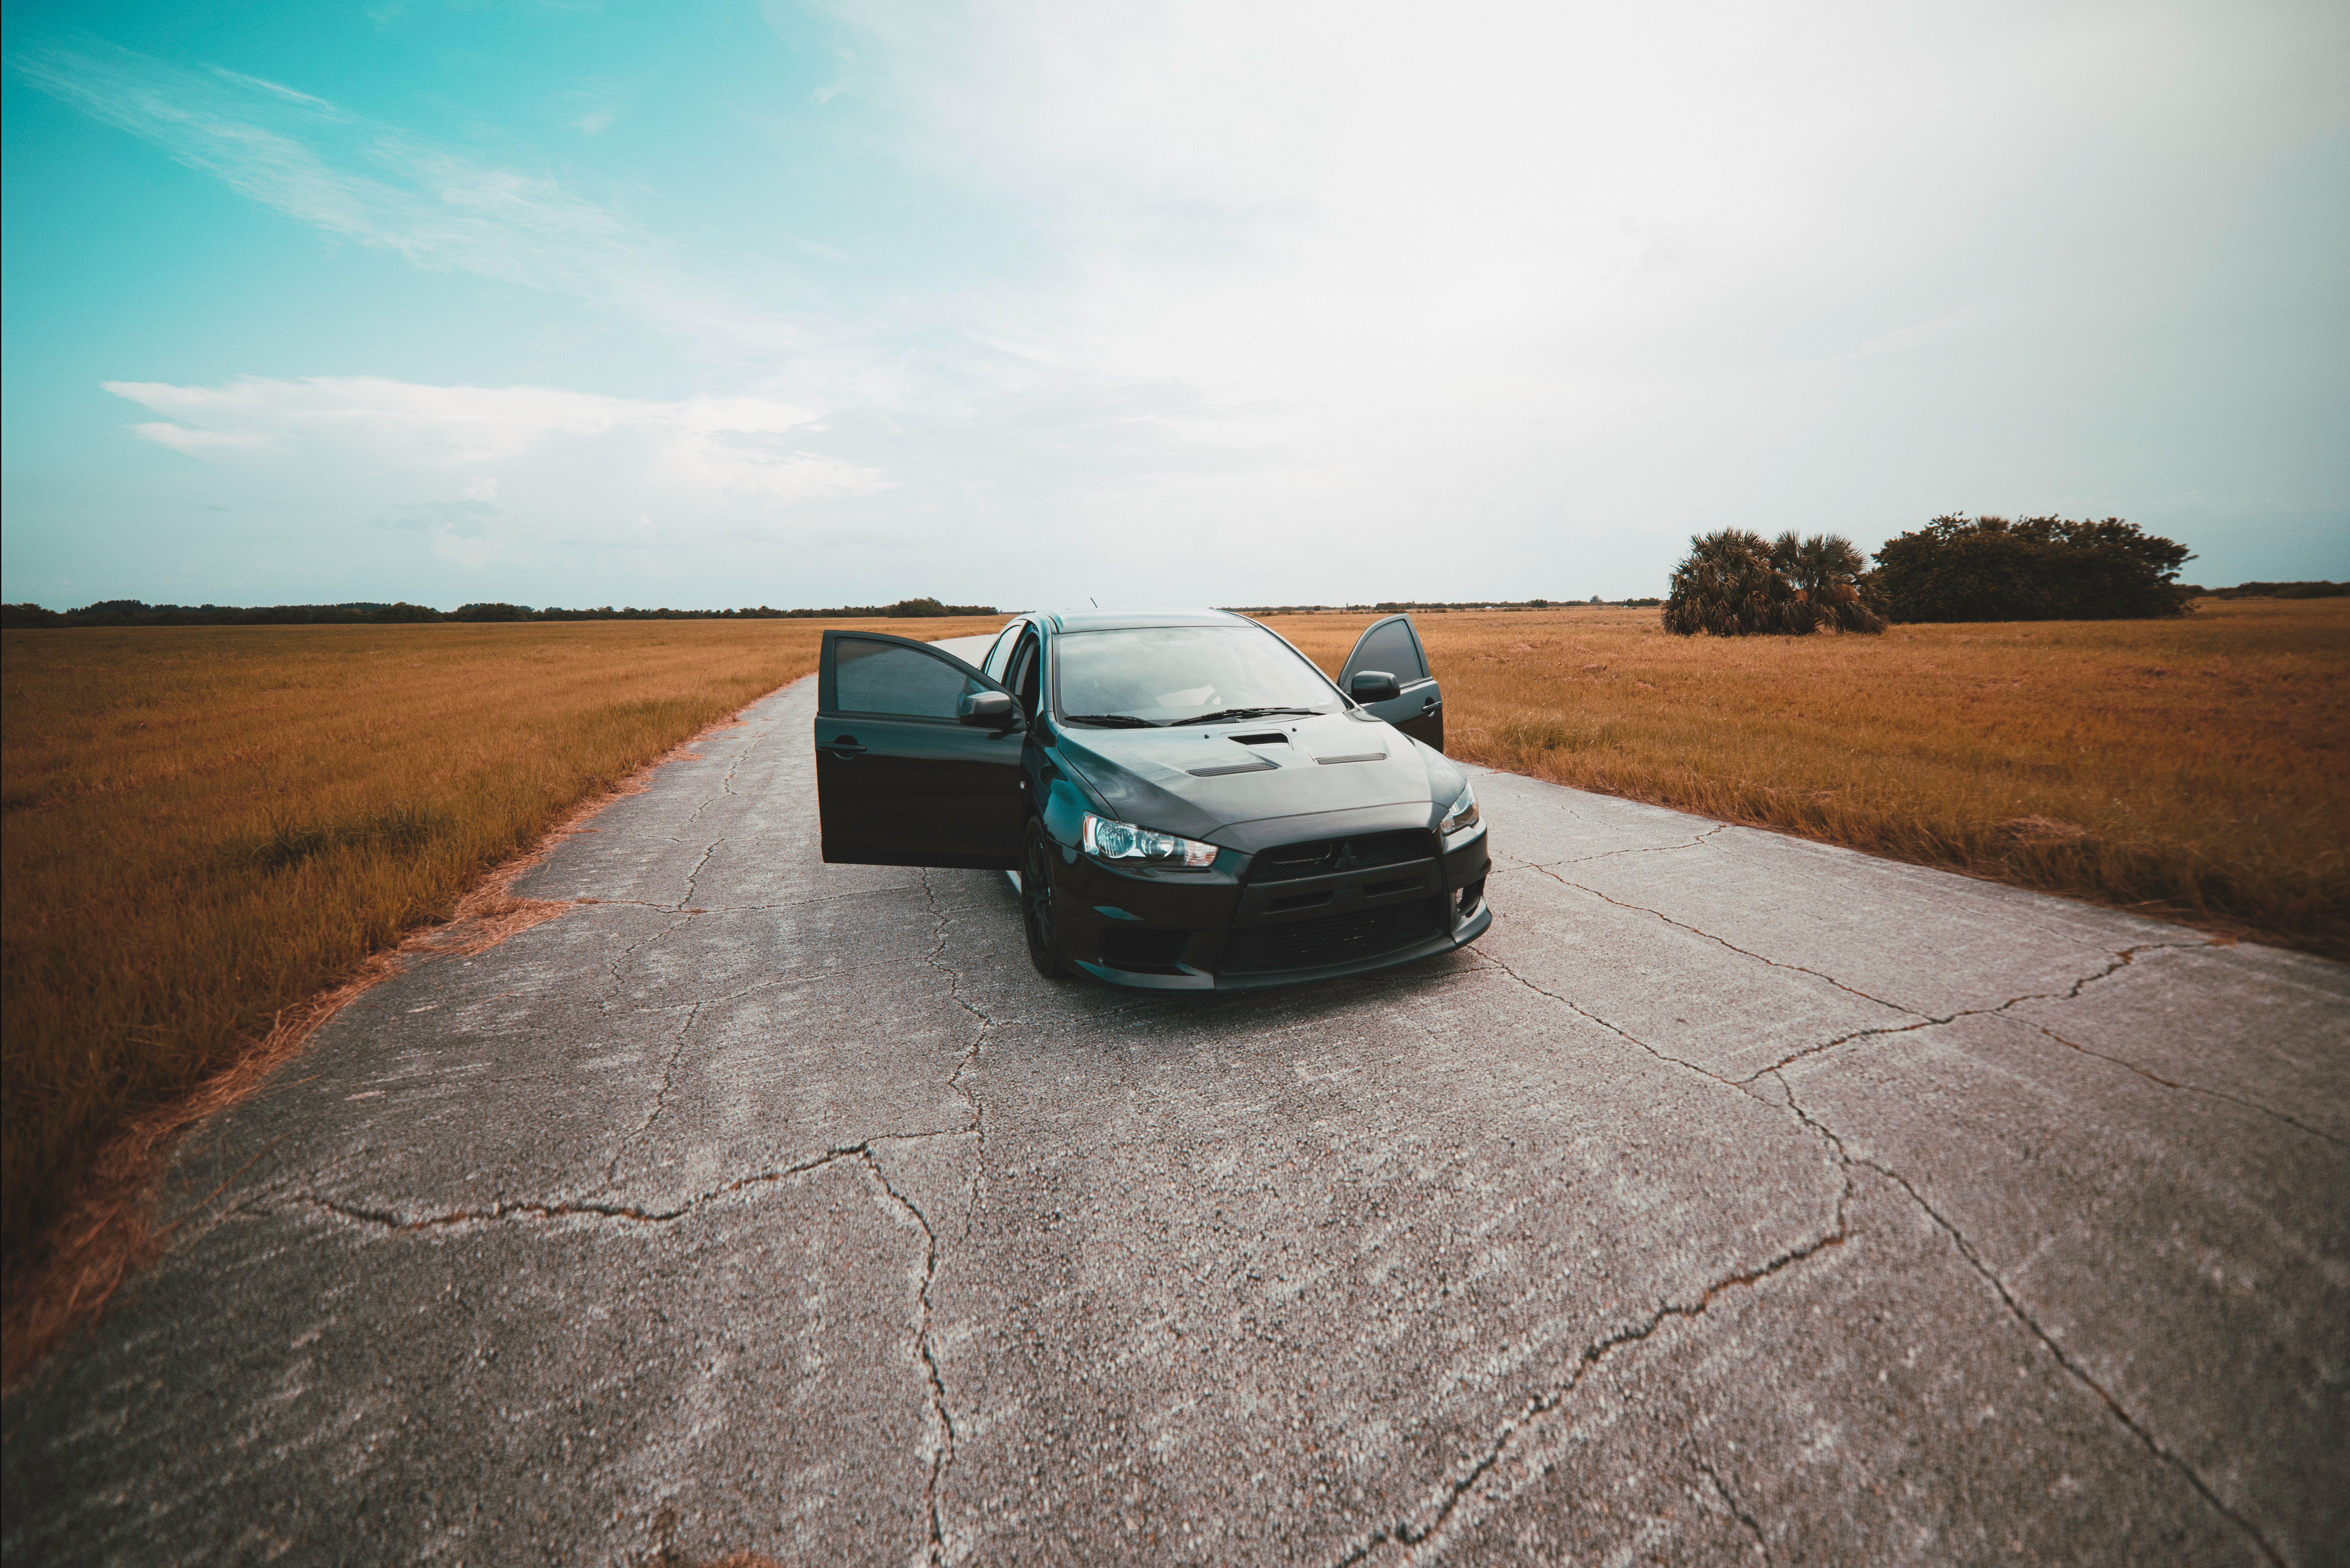 Pin by Nick on Cars Car, Car loans, Bad credit car loan